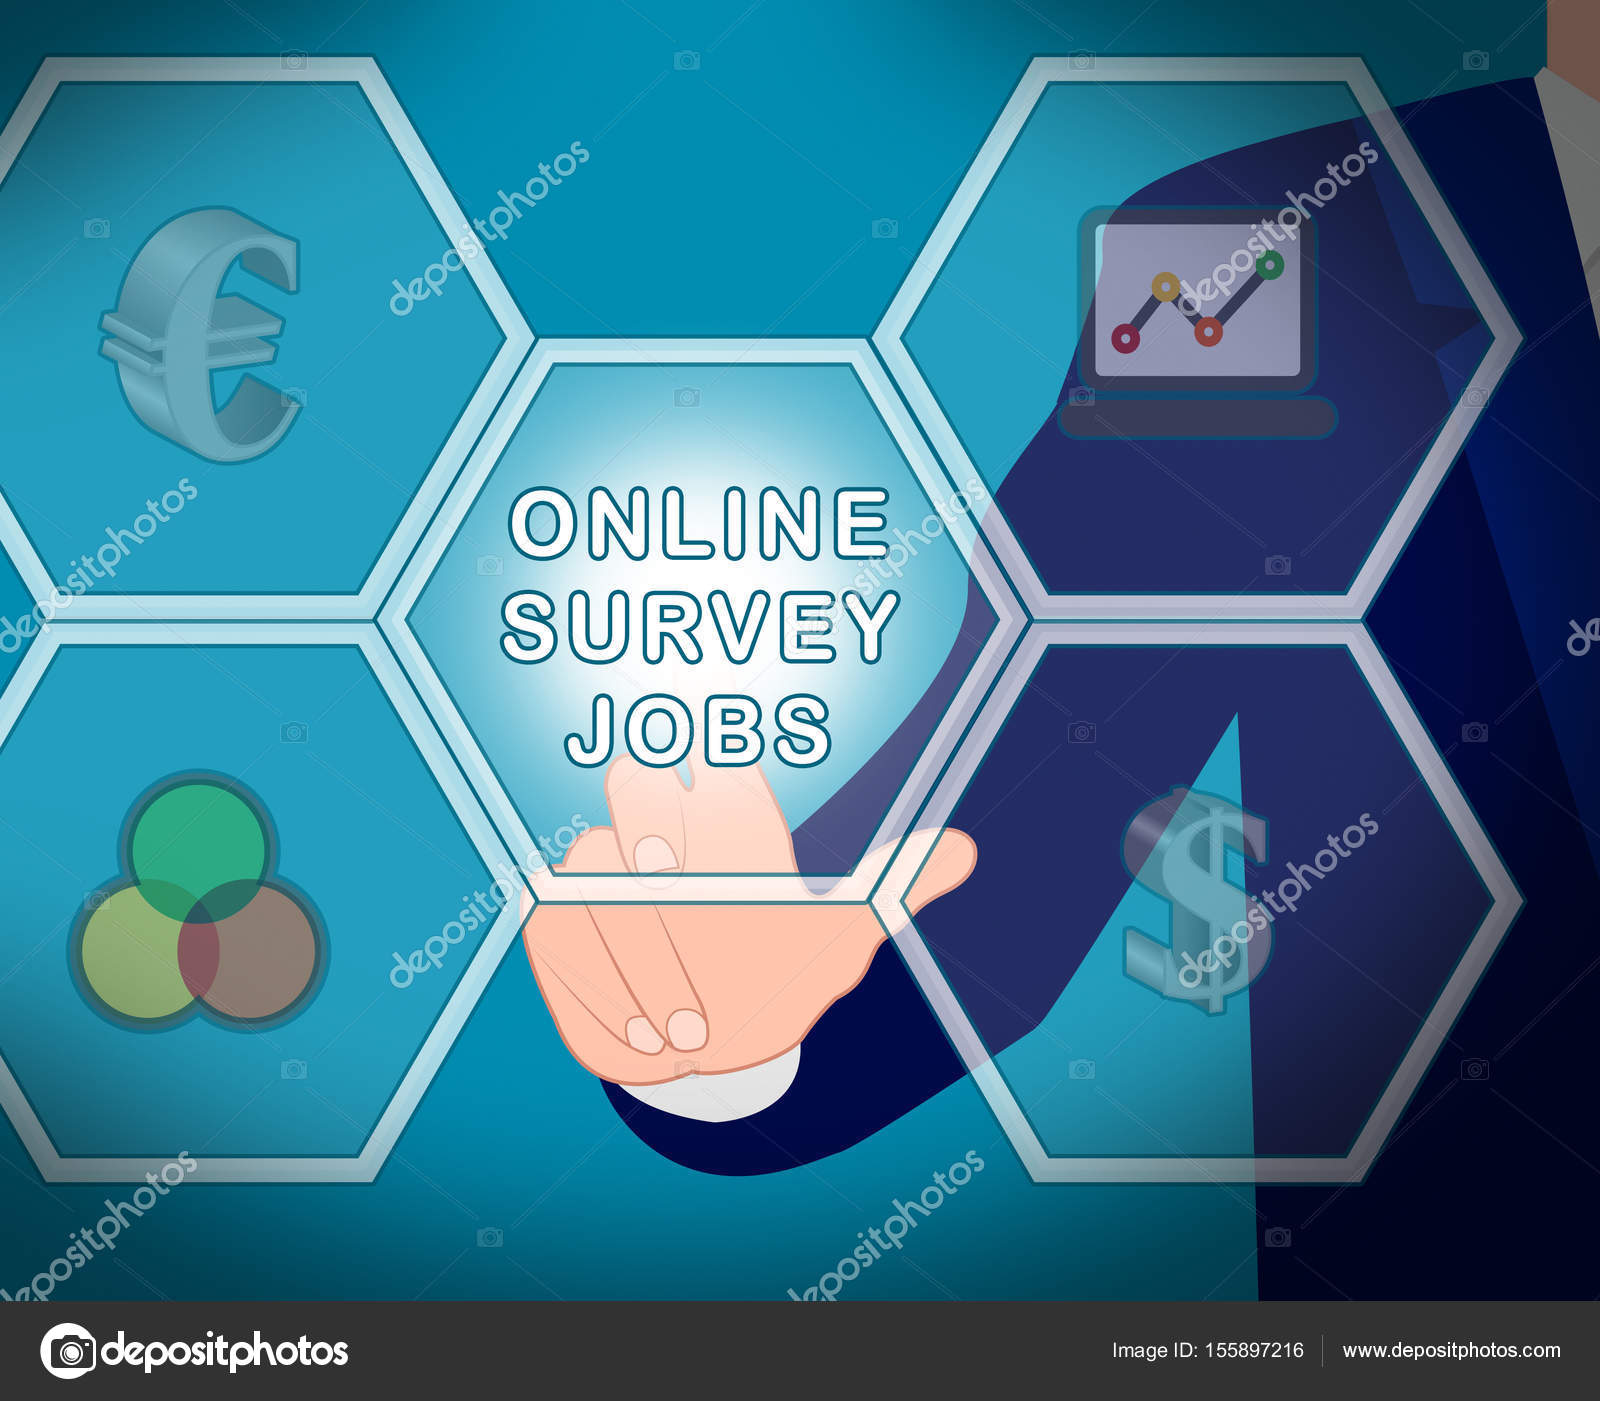 Онлайн опрос работа интернет финансовая система биткоин